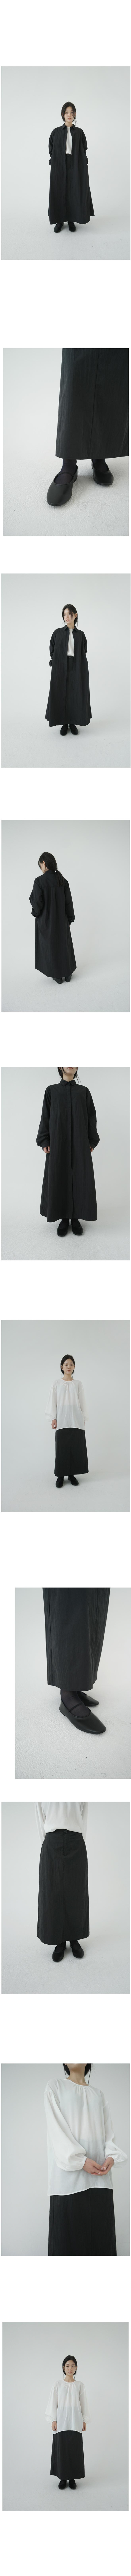 petit banding flat shoes